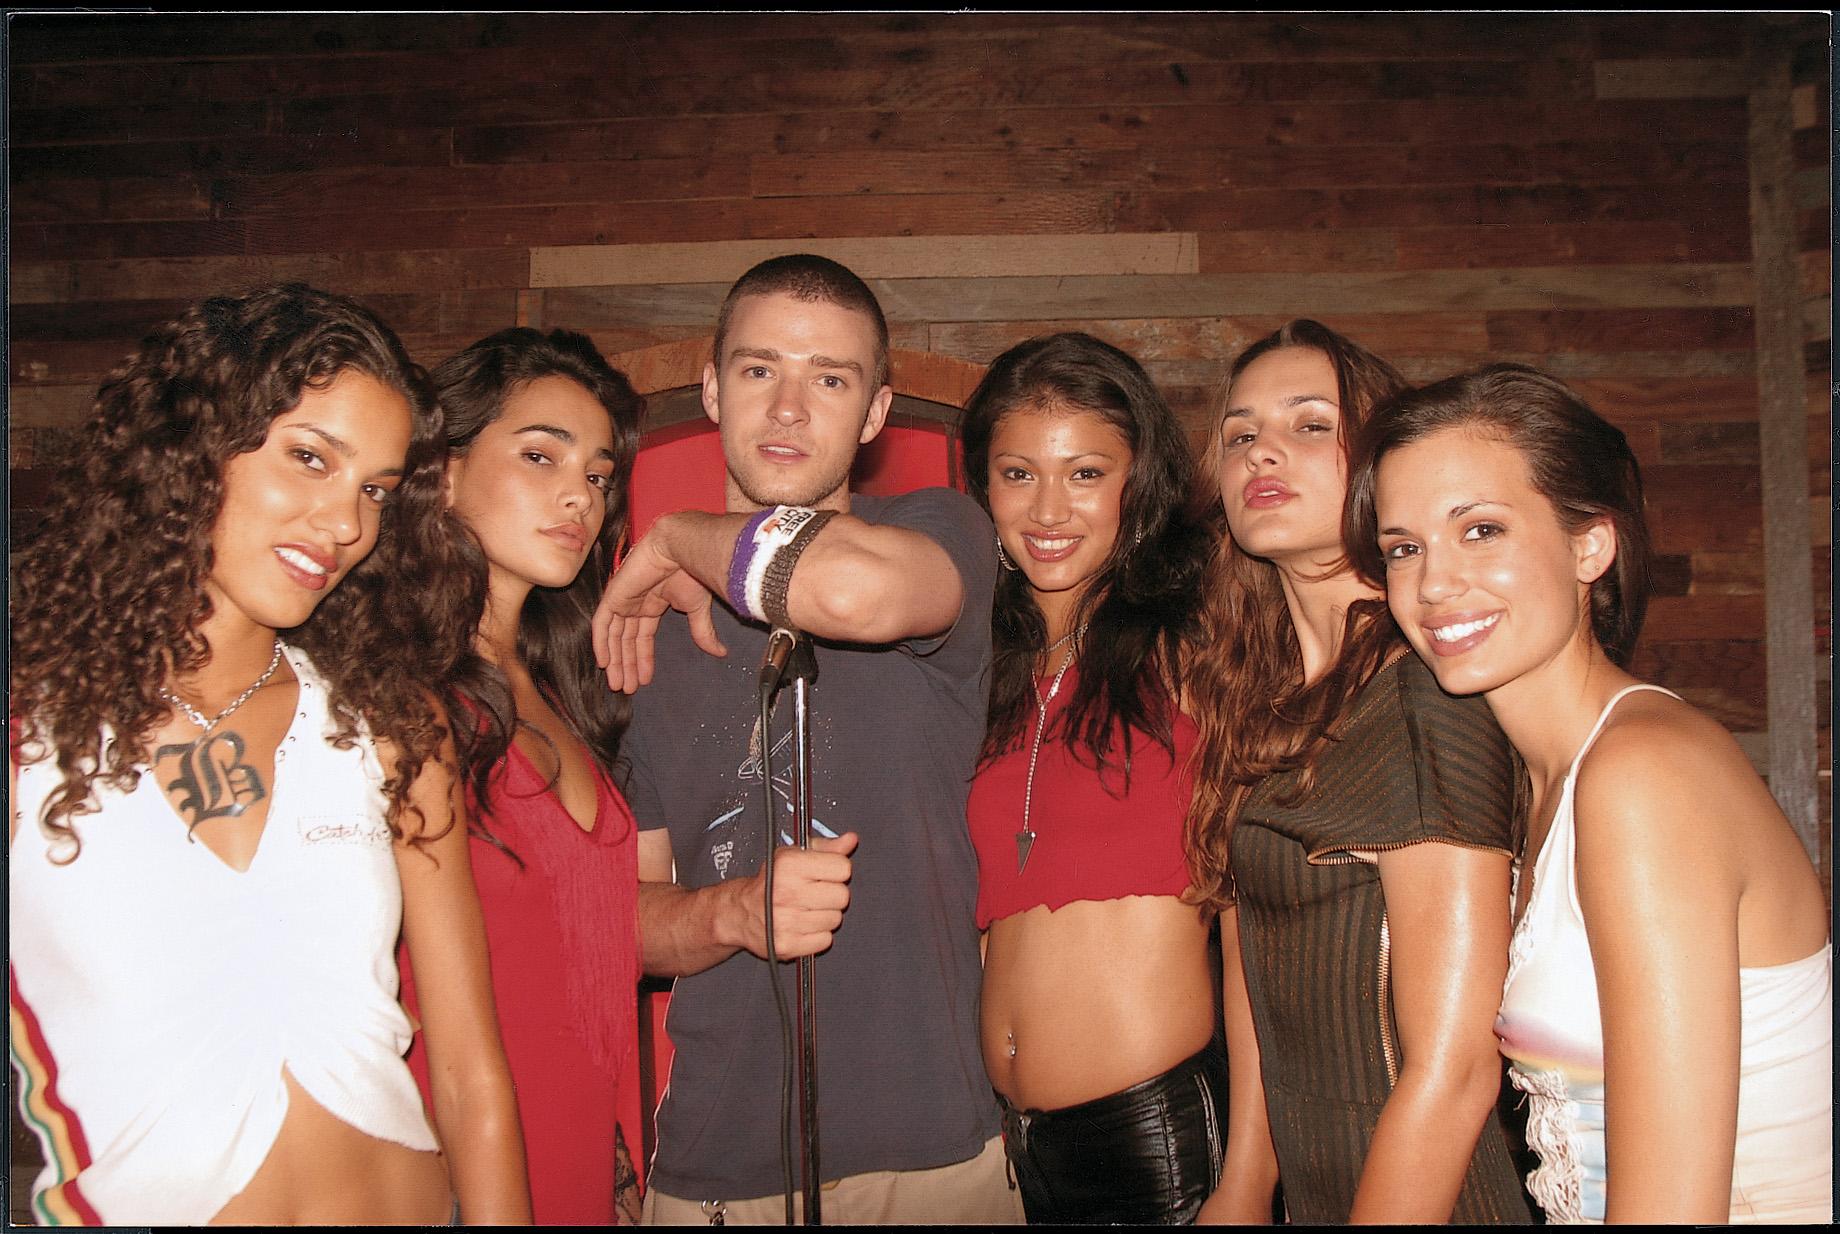 Justin Timberlake photo 99 of 588 pics, wallpaper - photo ...